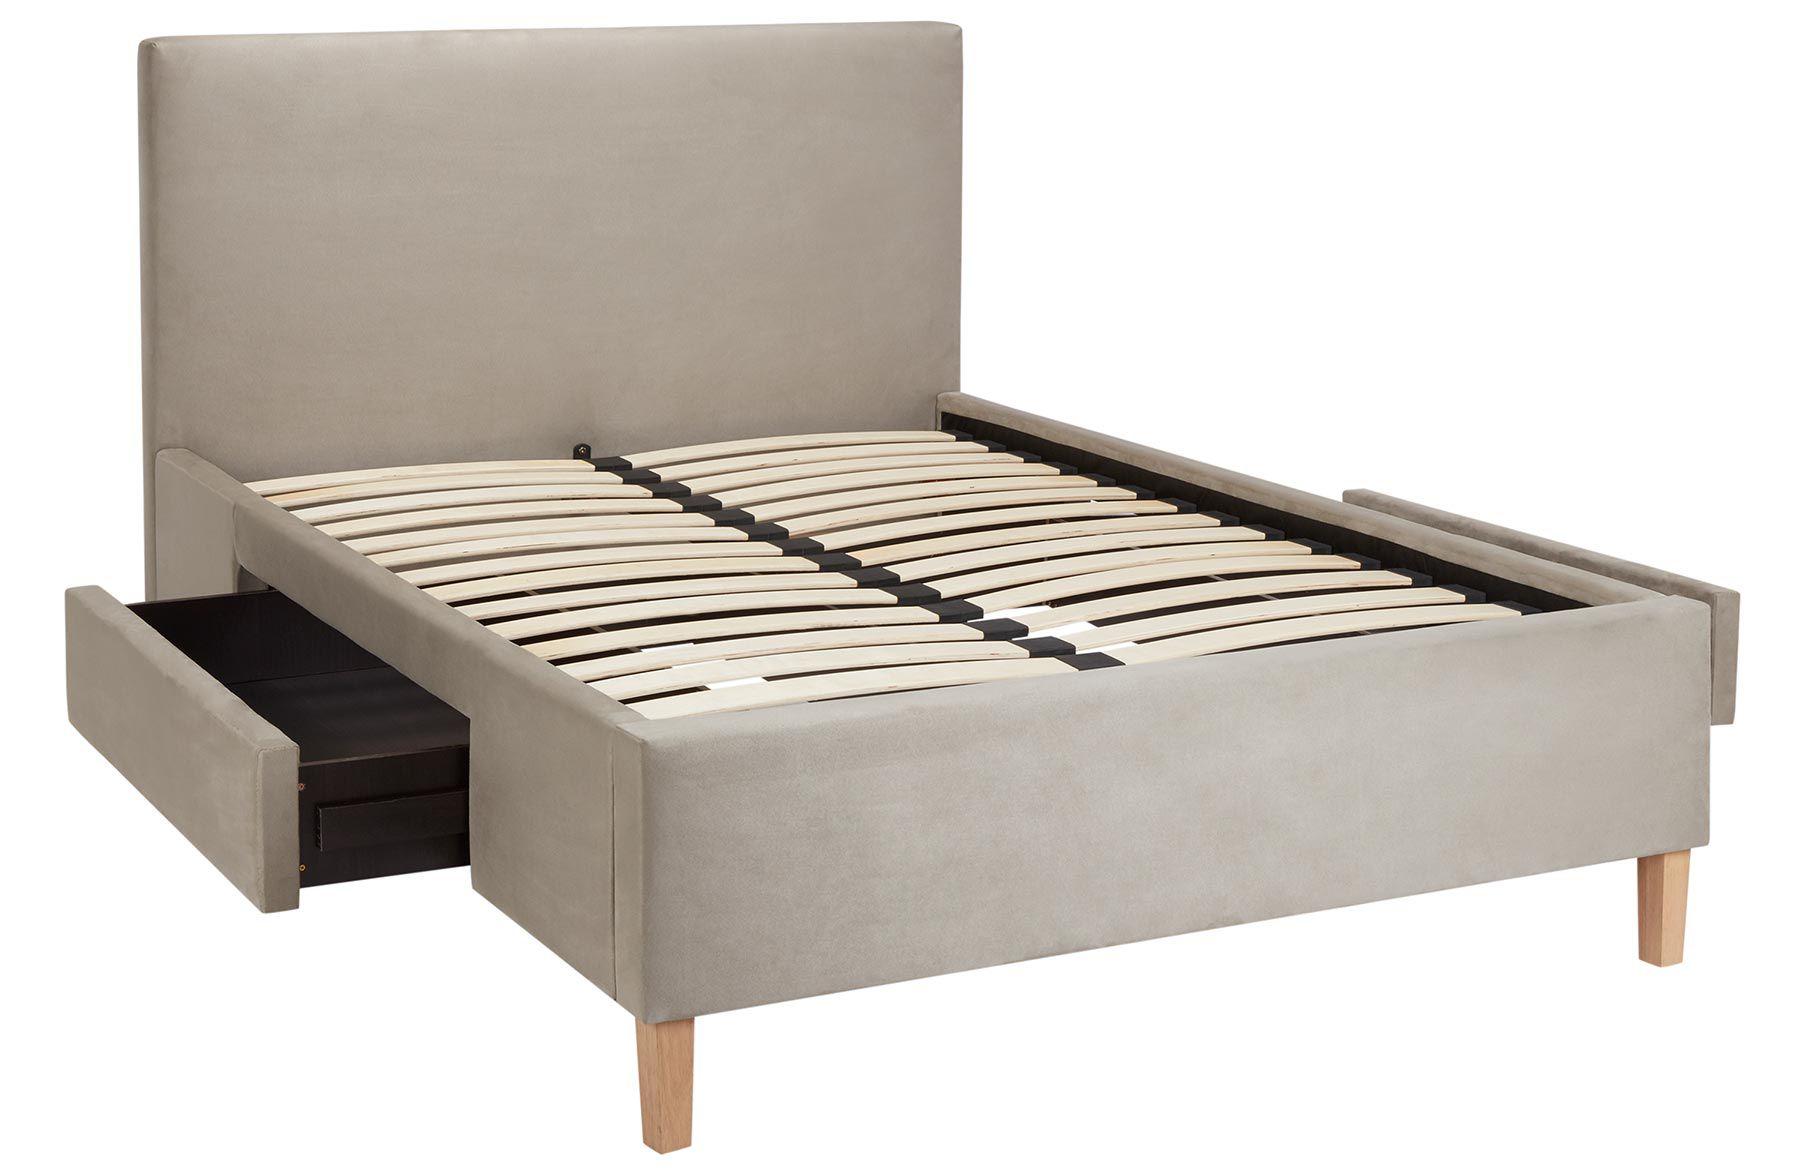 Stupendous Choosing The Ideal Bed Inzonedesignstudio Interior Chair Design Inzonedesignstudiocom